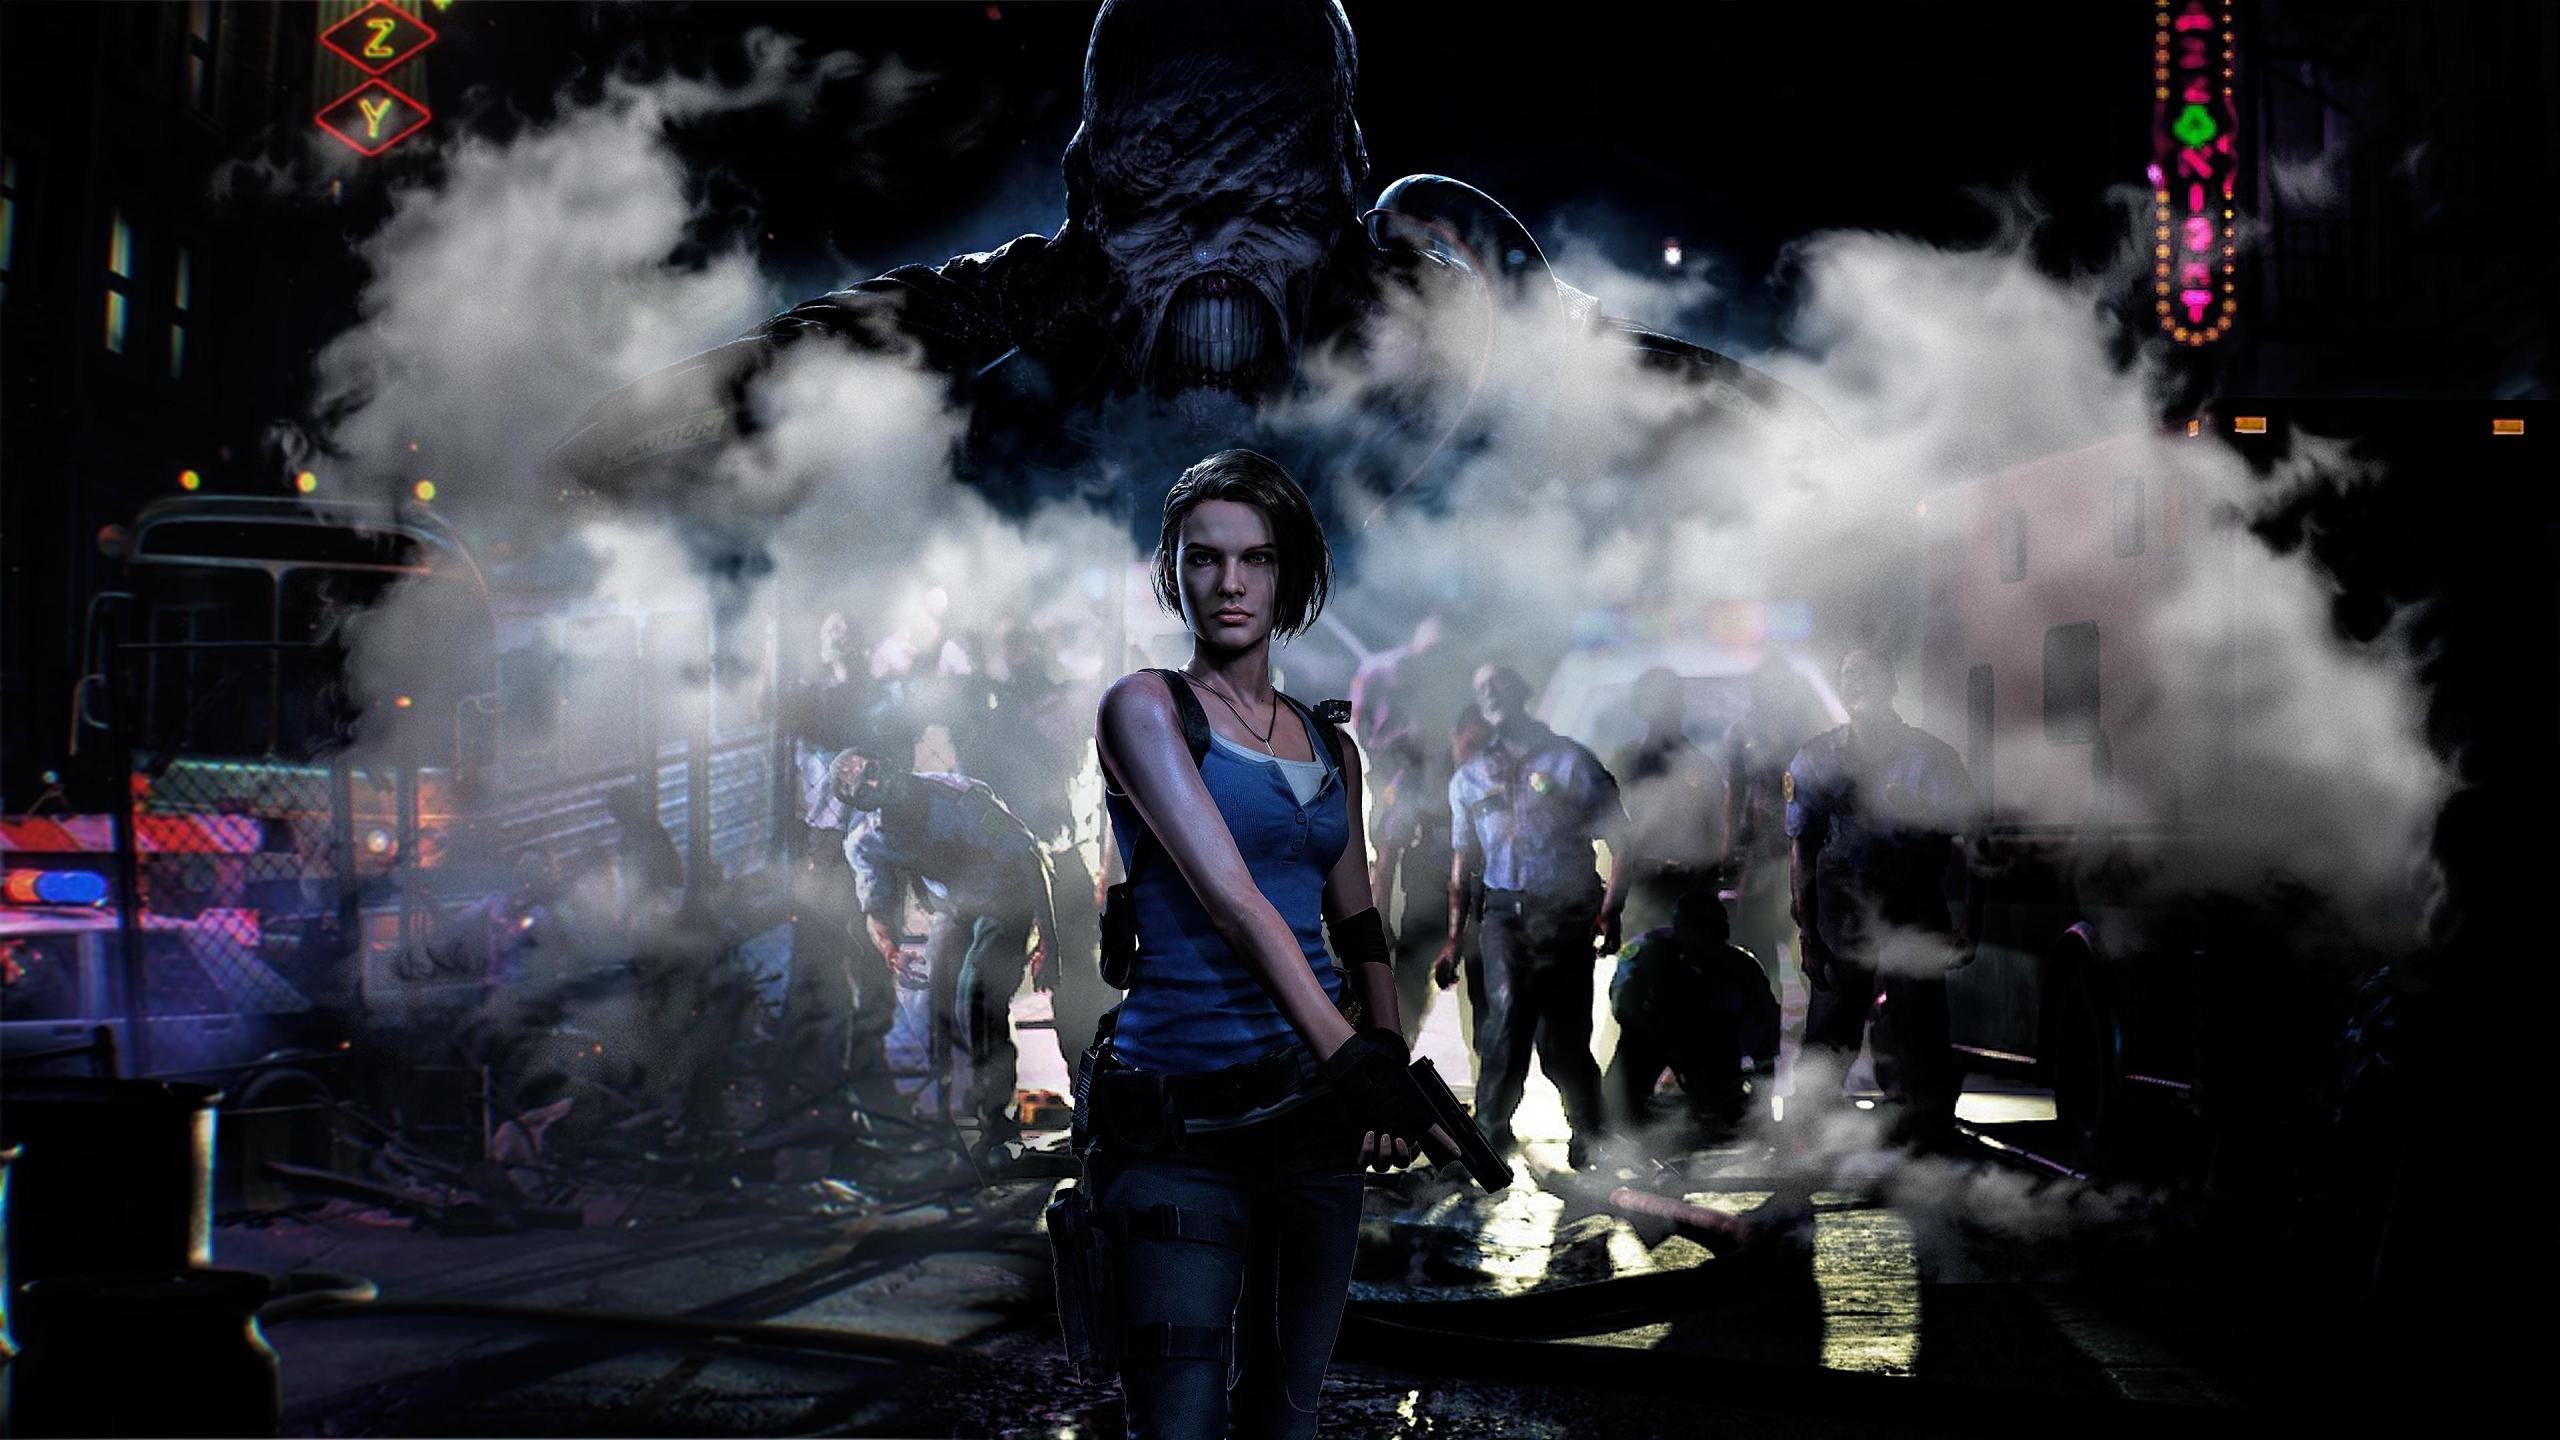 2560x1440 4k Jill Valentine Resident Evil 3 1440p Resolution